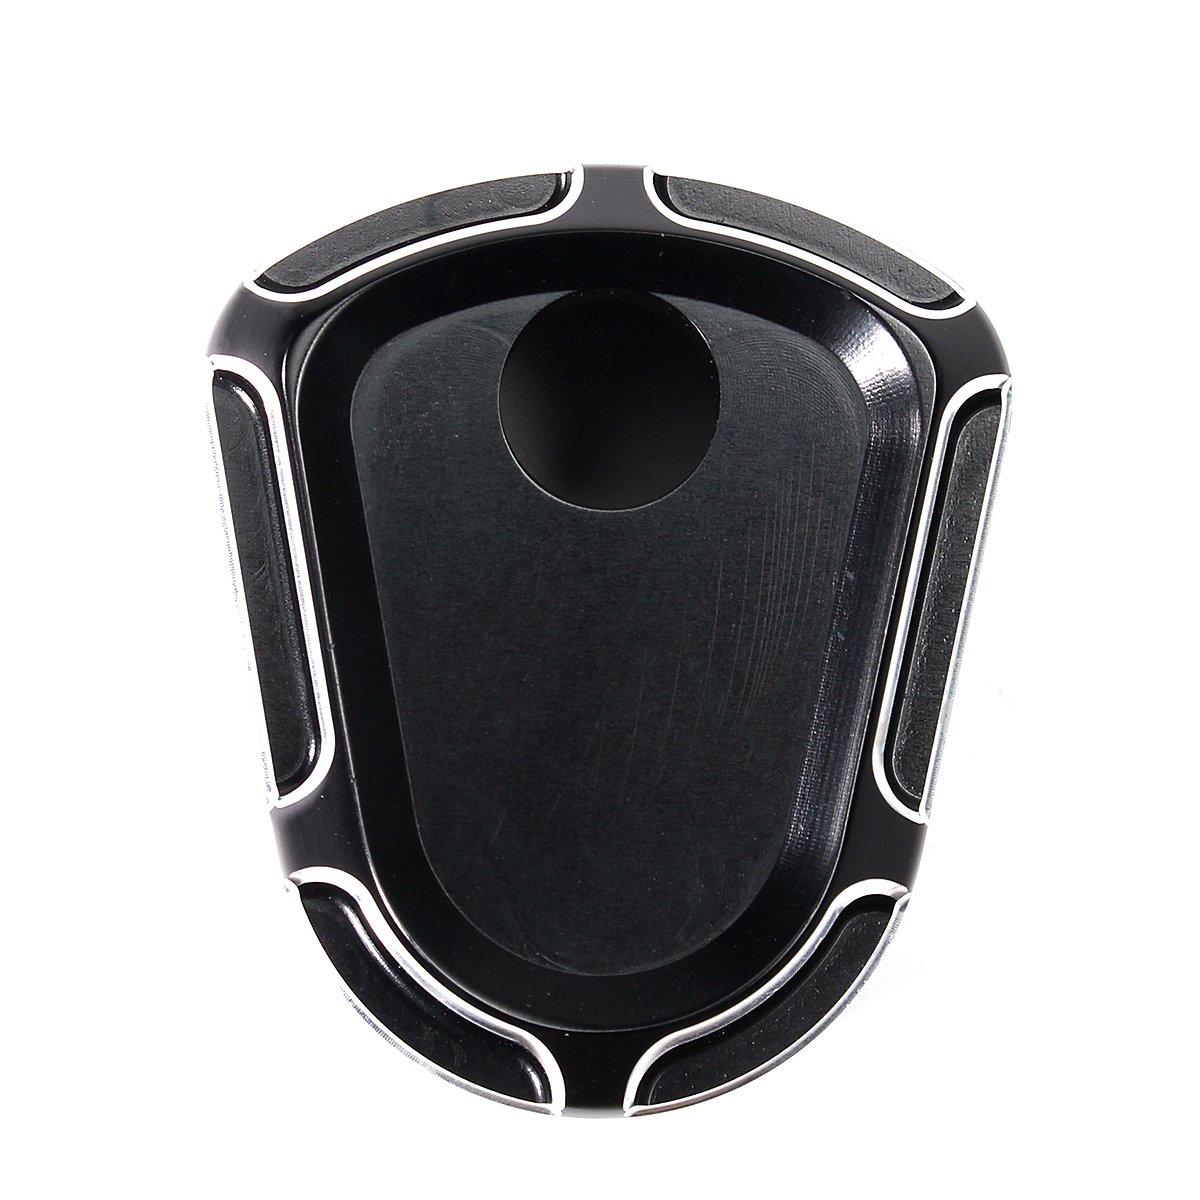 JenNiFer Black Deep Cut Ignition Switch Cover for Harley Street Glide 2007-2013